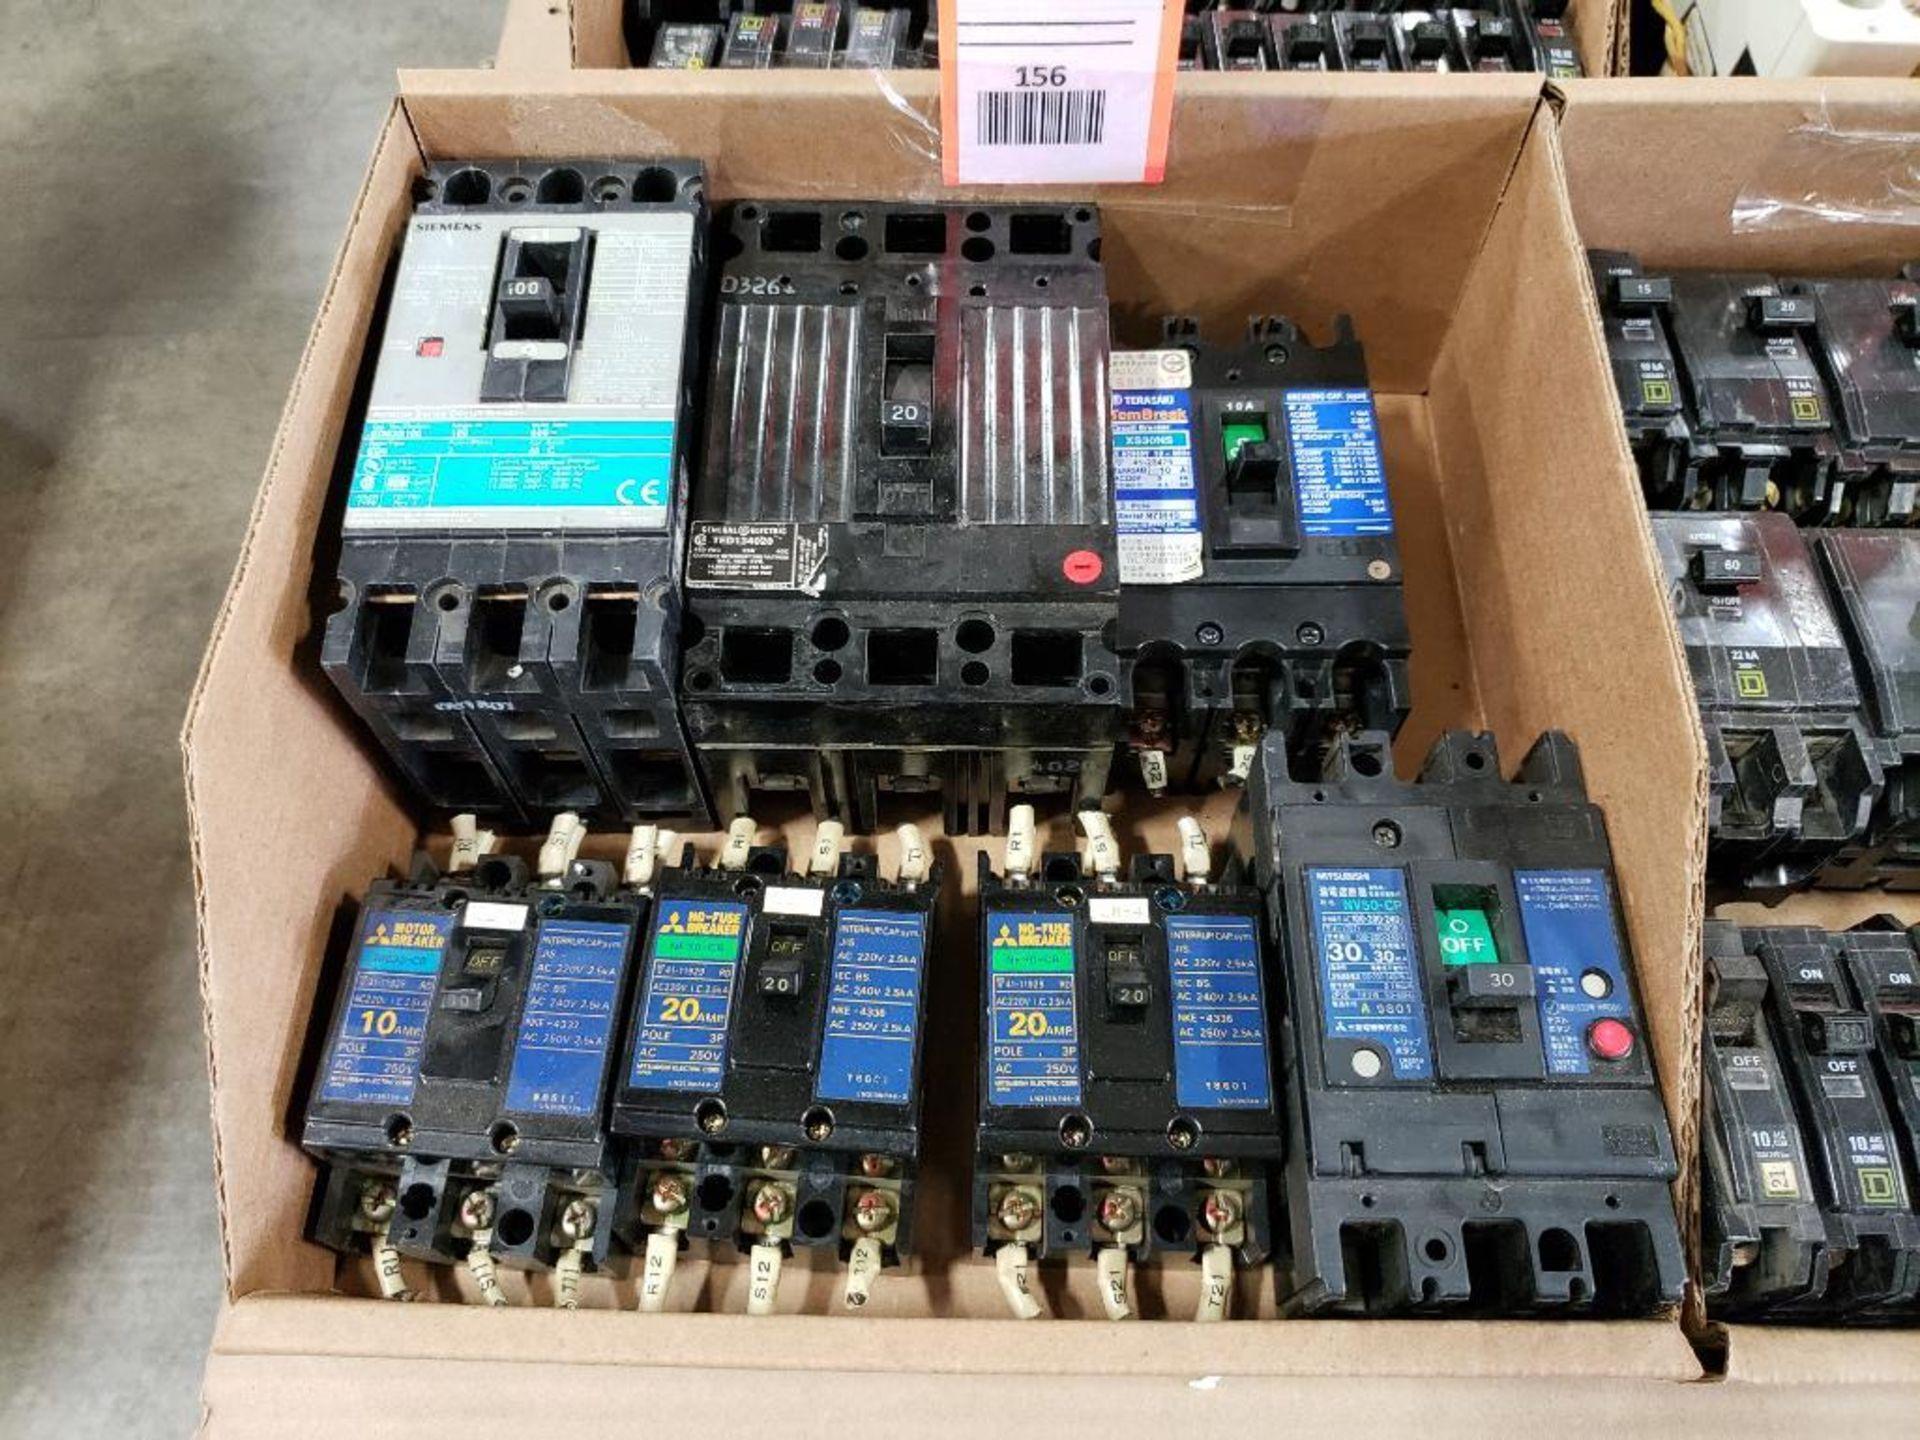 Assorted molded case breakers. Siemens, GE, Mitsubishi.